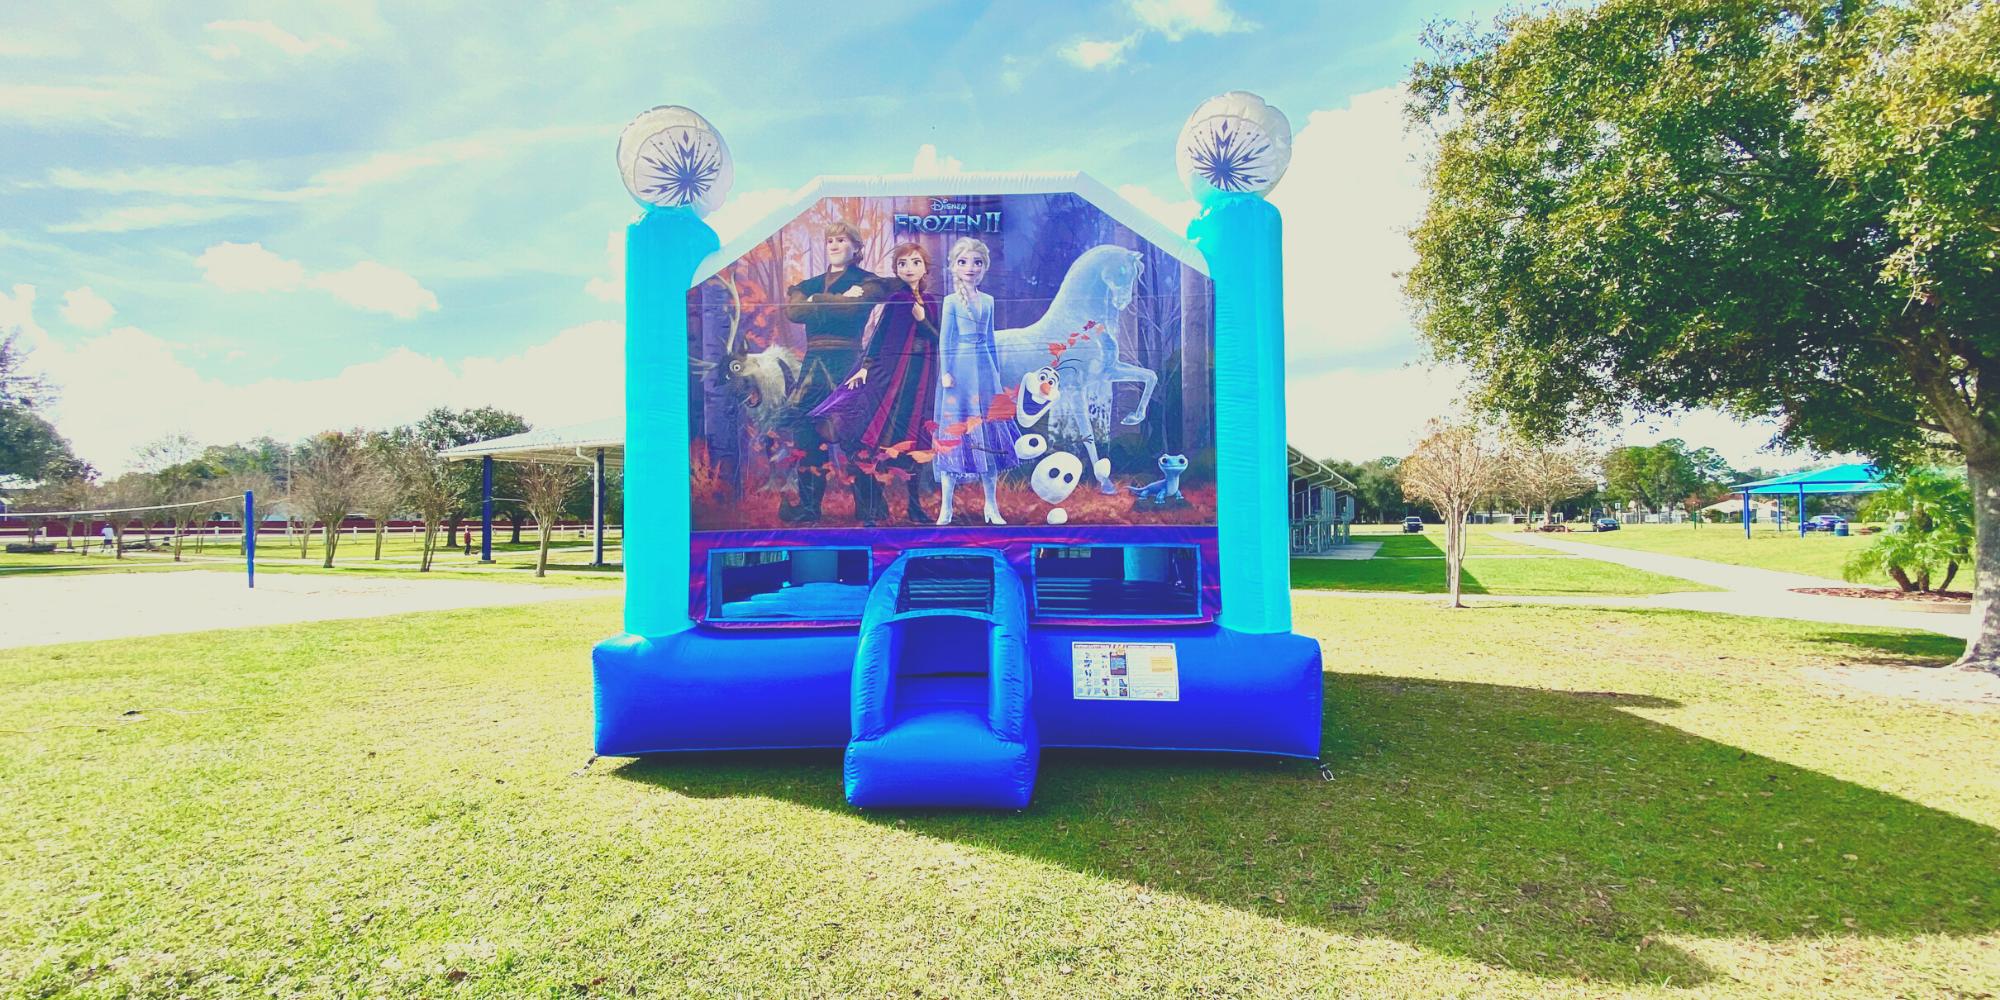 Frozen 2 Bounce House at a Community Park